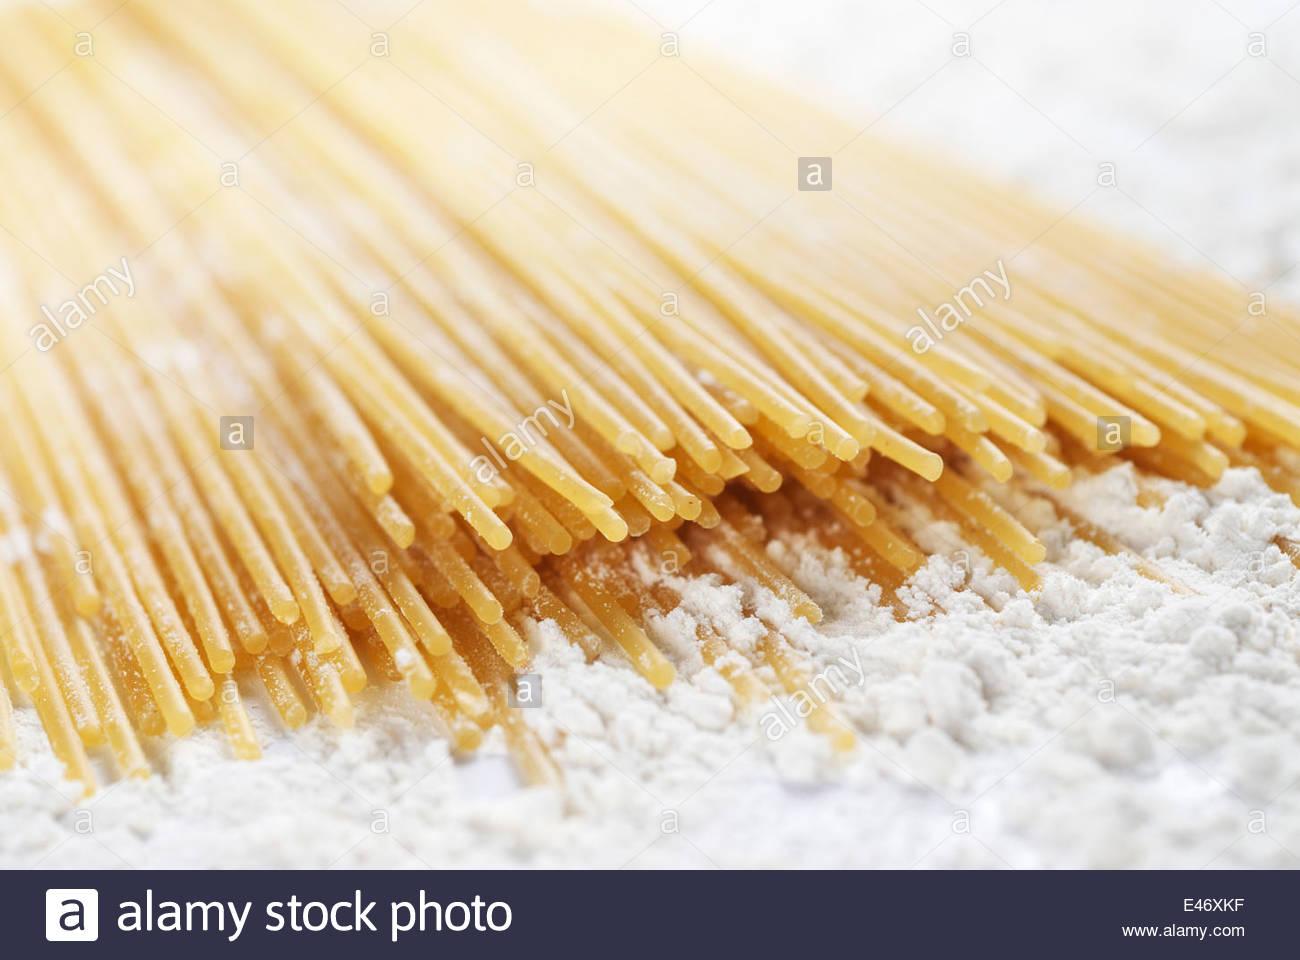 Libre de matières premières pâtes spaghetti avec de la farine Photo Stock